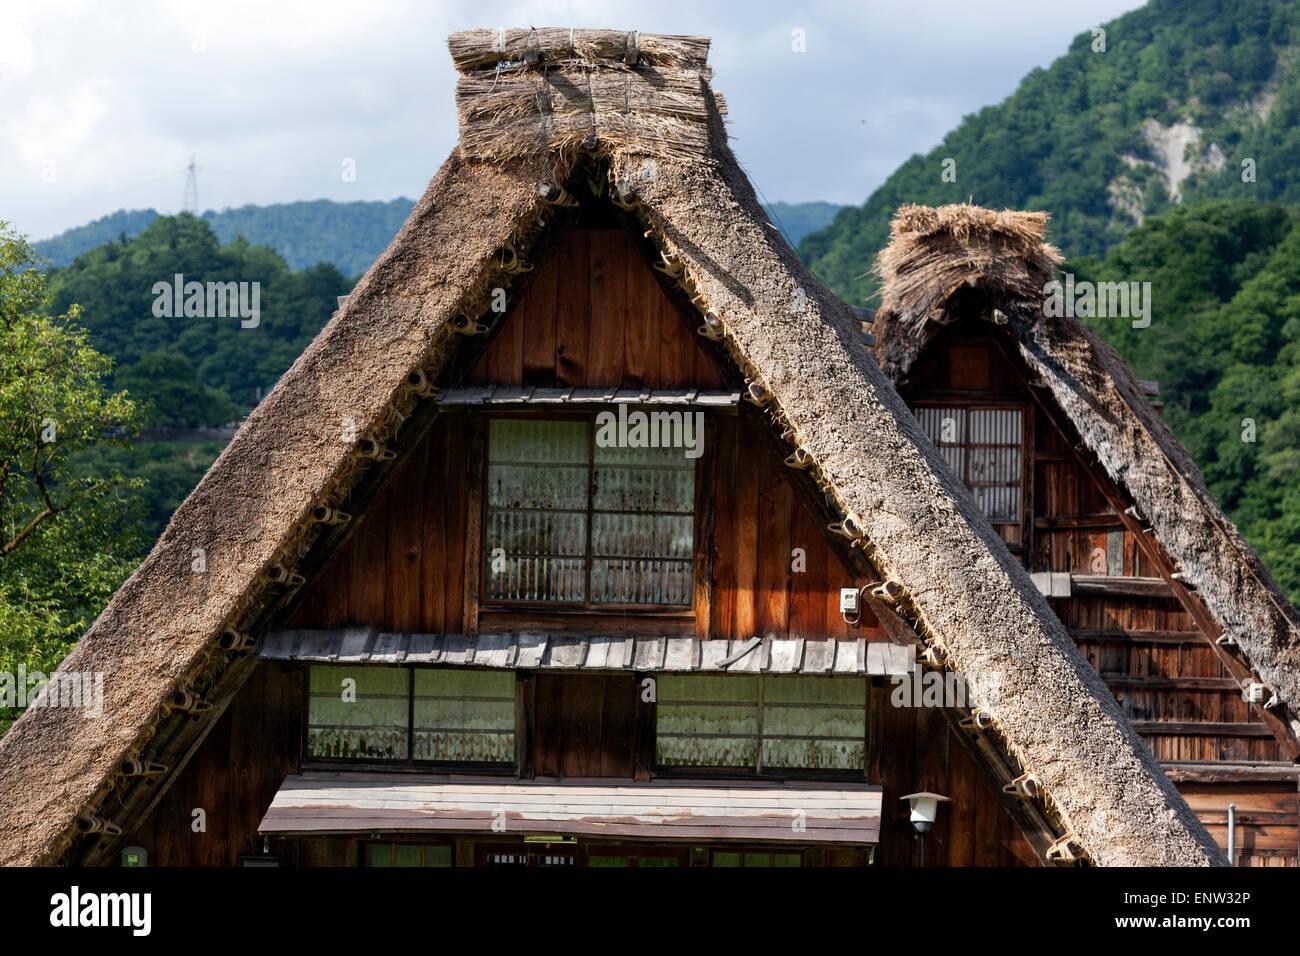 Roof of  gasshō-zukuri houses in the traditional villages of Shirakawa-gō and Gokayama a traditional village - Stock Image